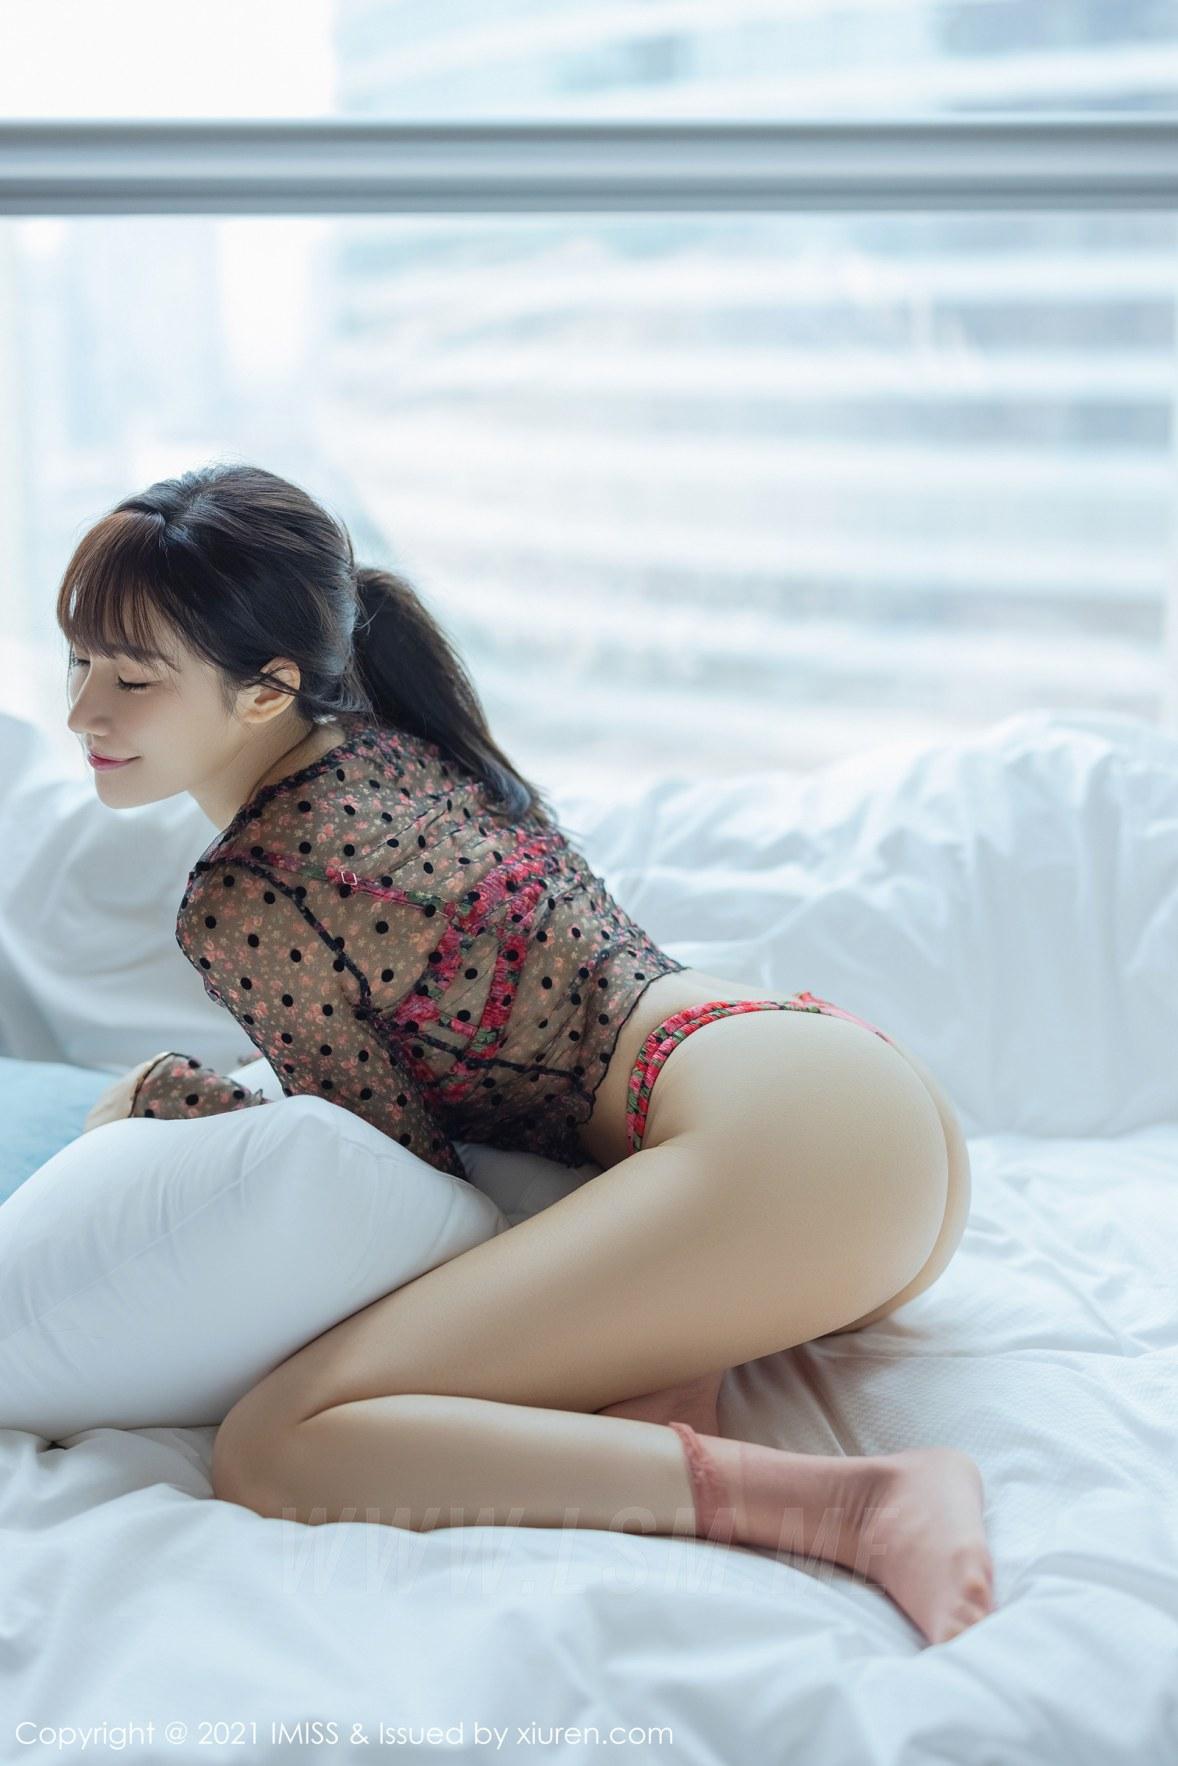 IMiss 爱蜜社 Vol.574 小狐狸Kathryn 色彩鲜艳诱人的内衣 - 2